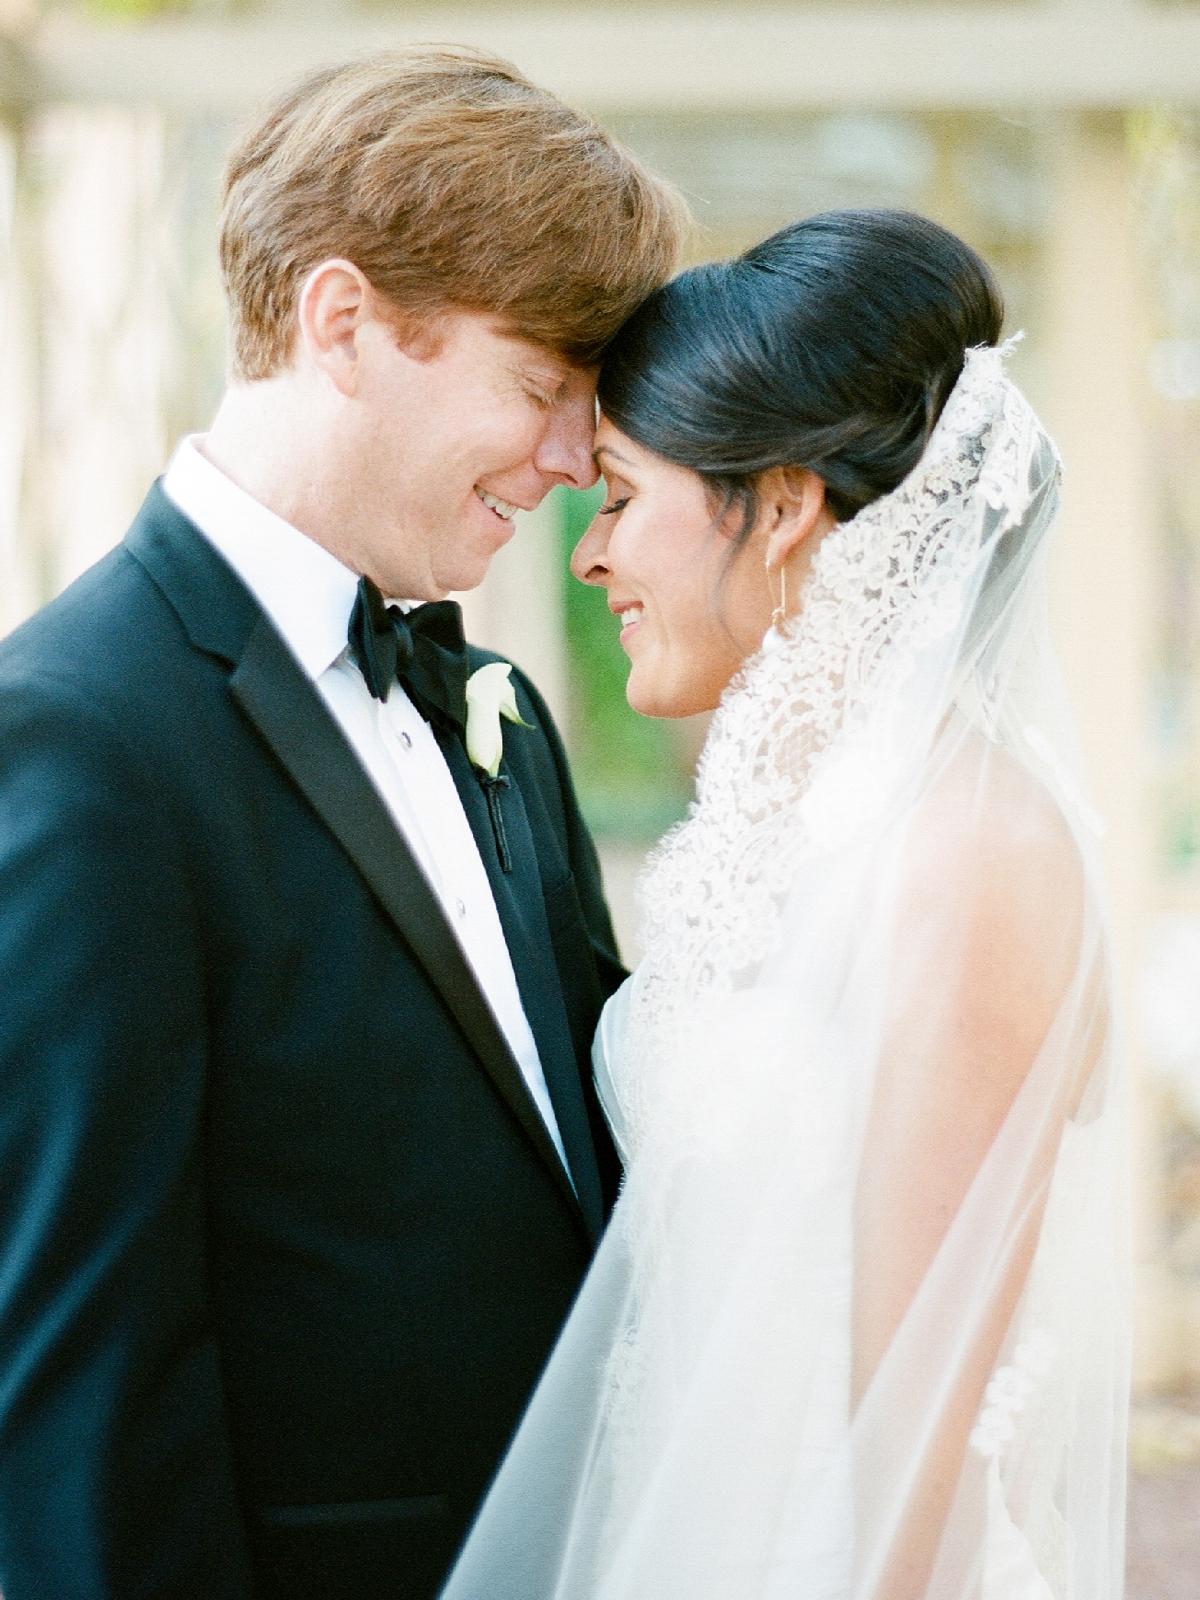 atrium at curtis center wedding photographer philadelphia wedding photographer shannon griffin_0076.jpg